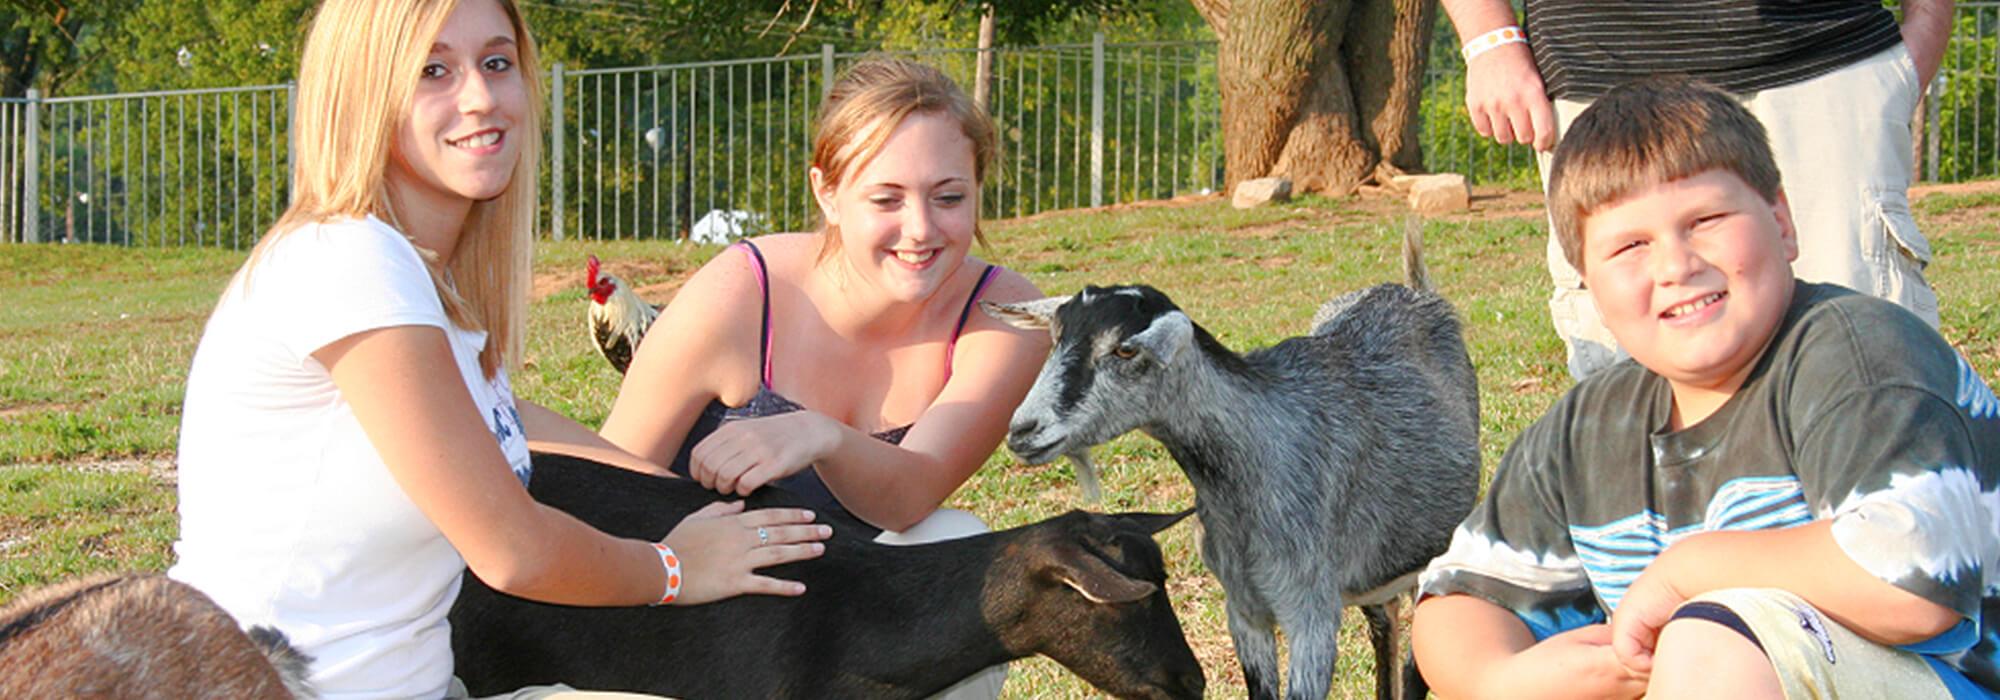 Granny Jones Petting Farm   Beech Bend Amusement Park - Bowling Green, KY